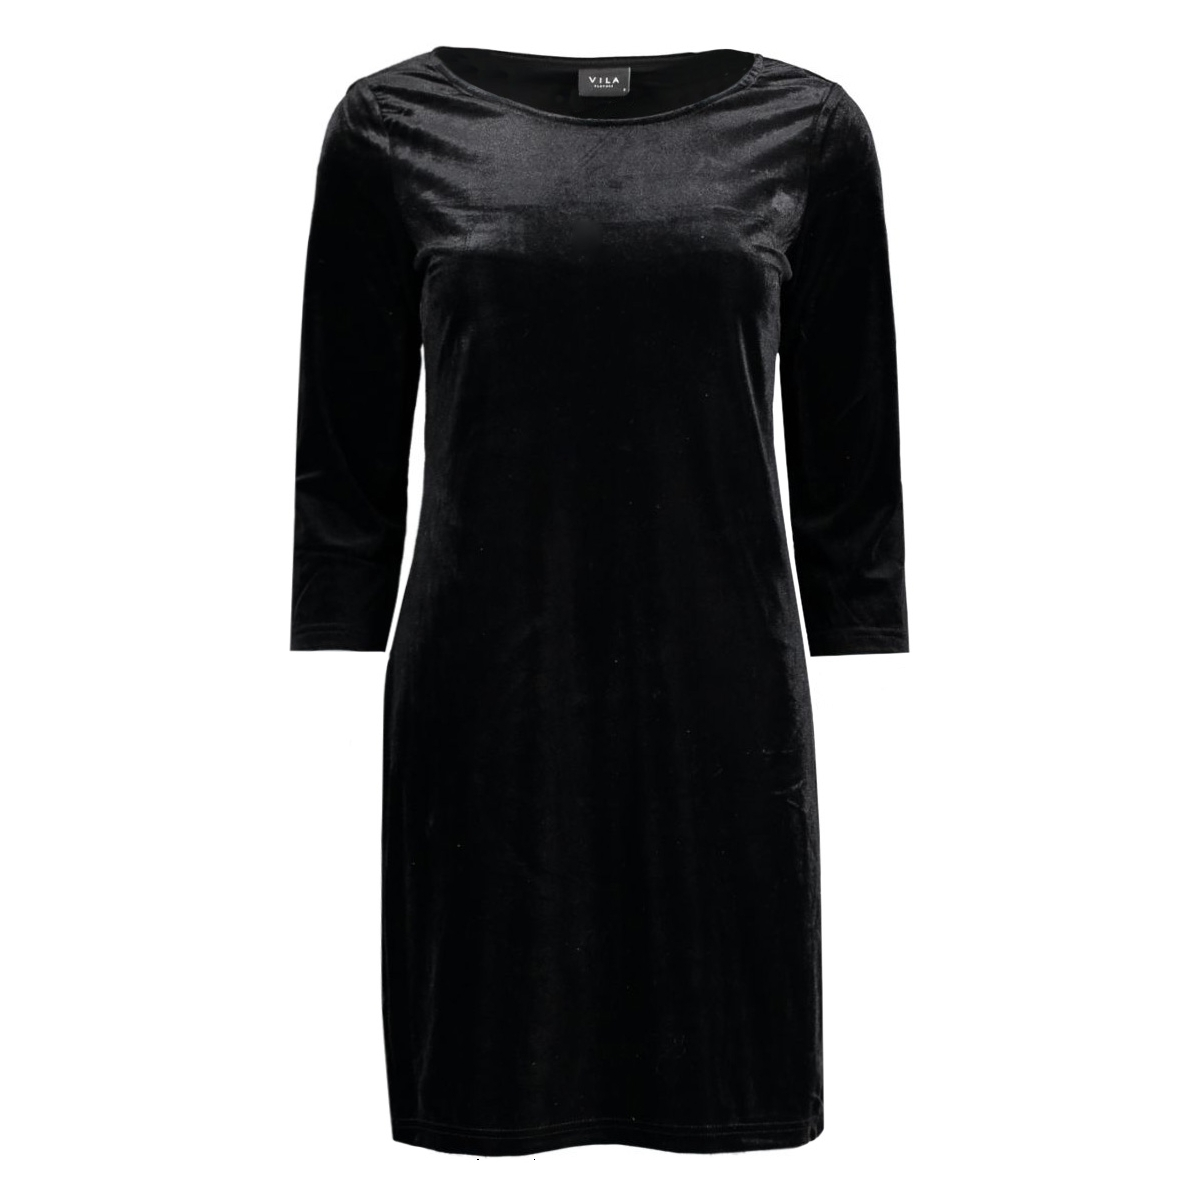 visienna 3/4 sleeve dress 14037826 vila jurk black